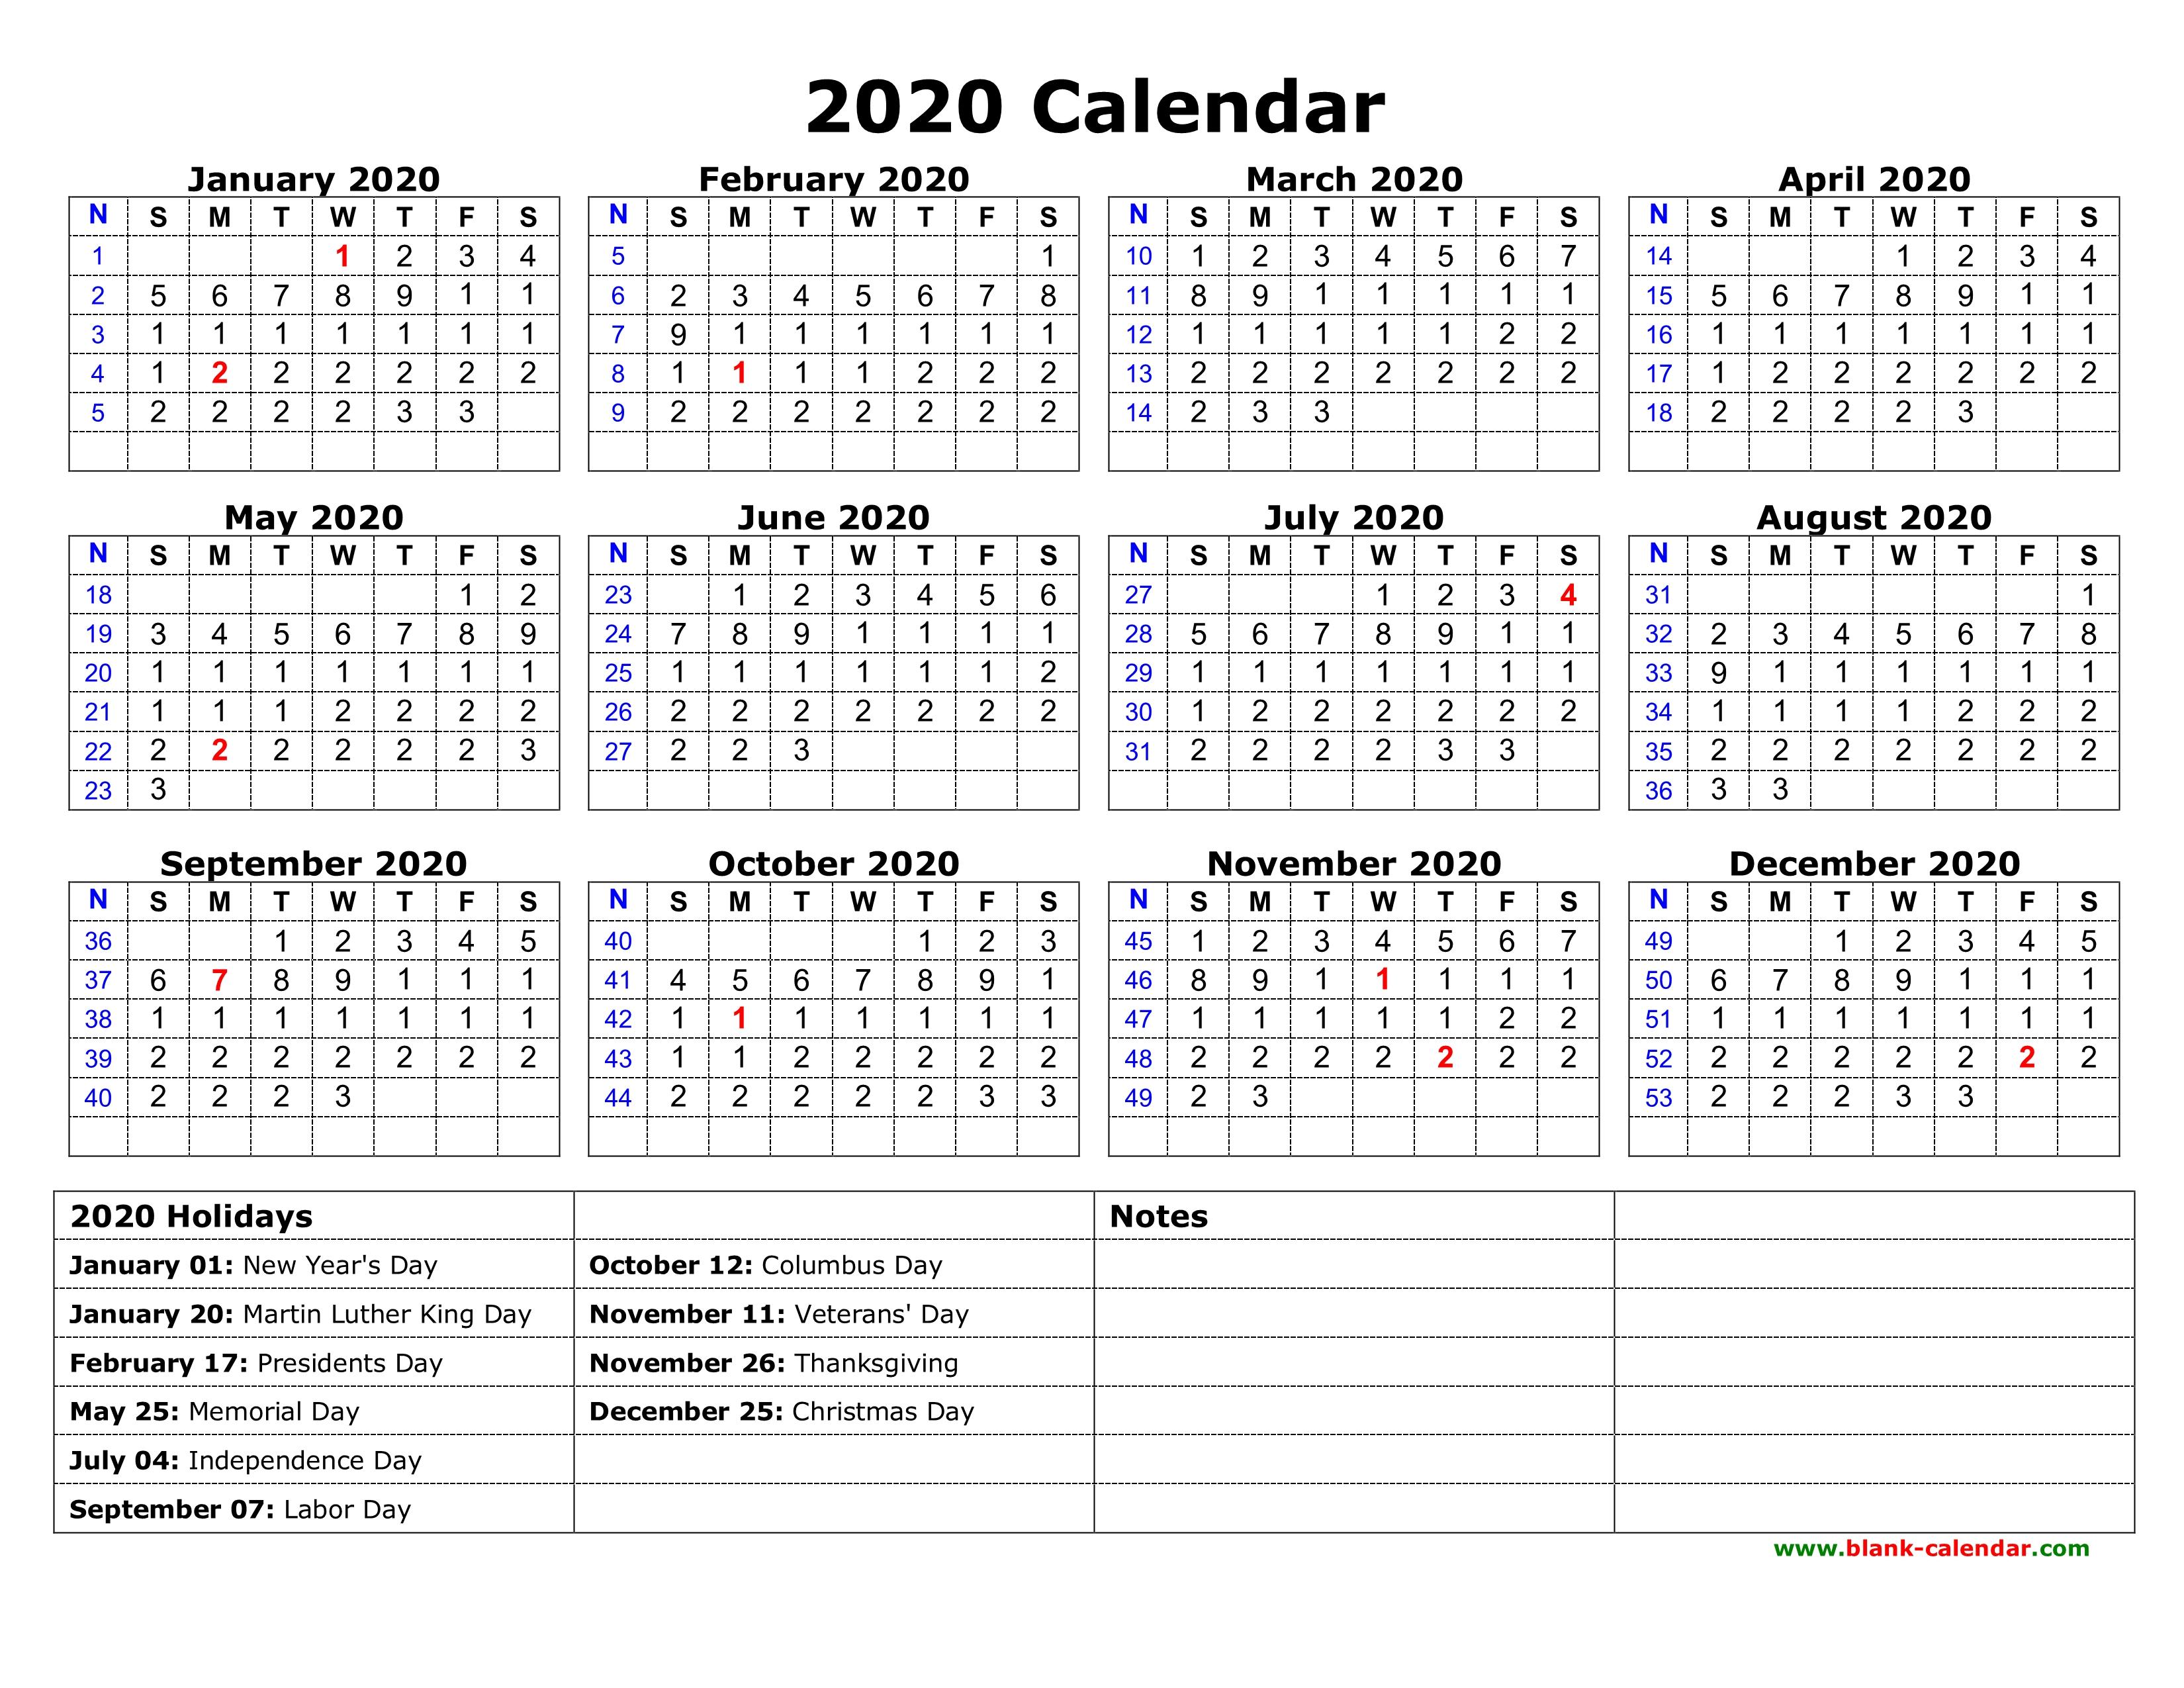 Us Calendar 2020 - Wpa.wpart.co regarding Calendar At A Glance With Usa Holidays For 2020